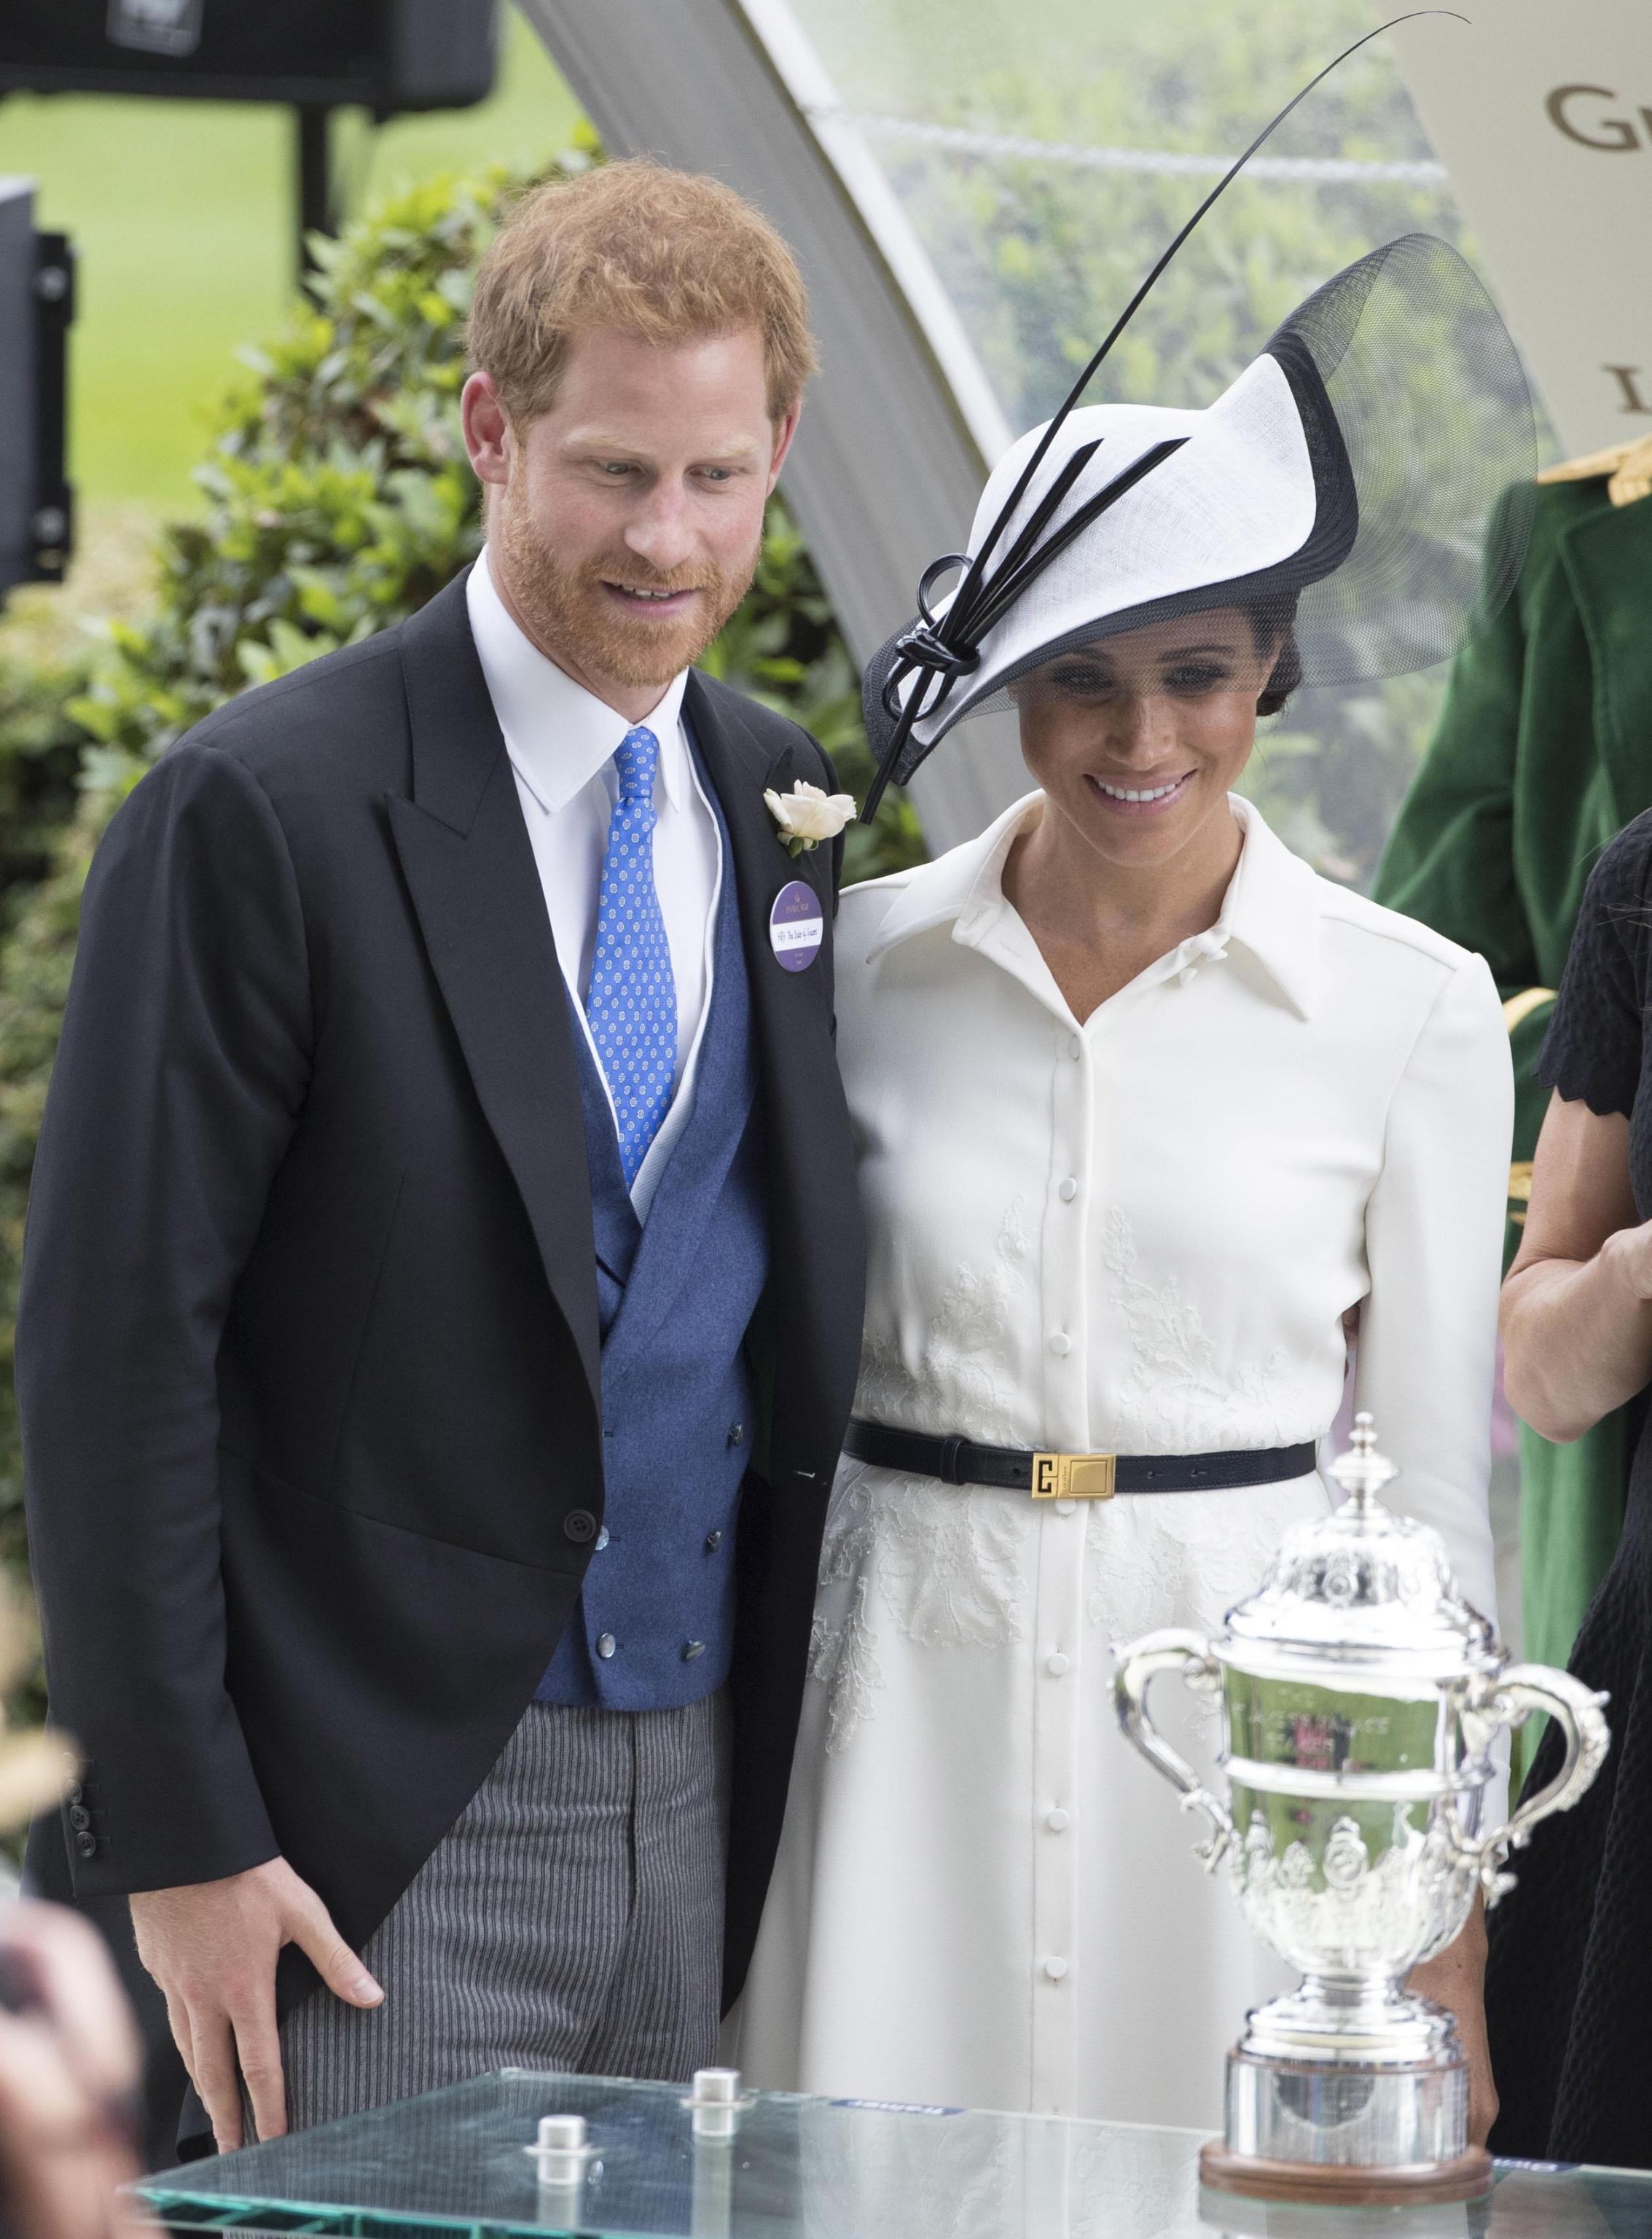 Il look Givenchy di Meghan Markle a Royal Ascot 2018